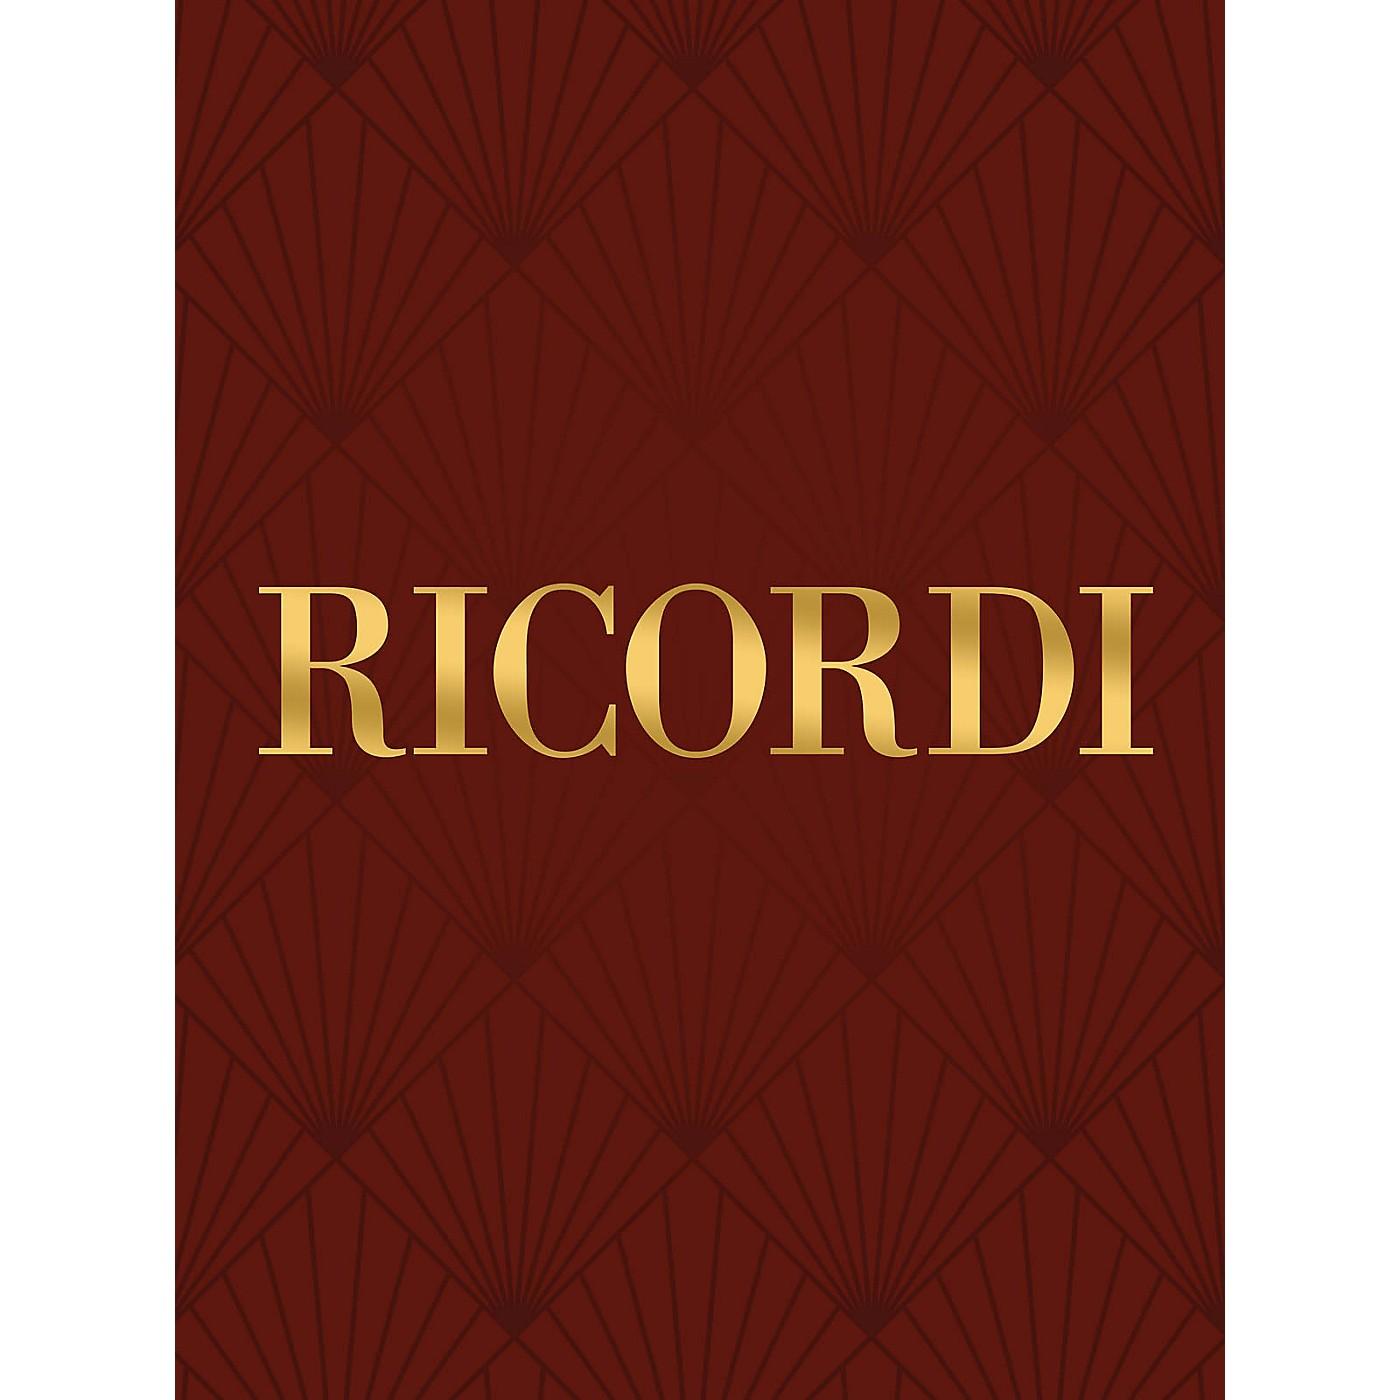 Ricordi Sonata in G Major for 2 Violins and Basso Continuo RV74 Study Score by Vivaldi Edited by Paul Everette thumbnail